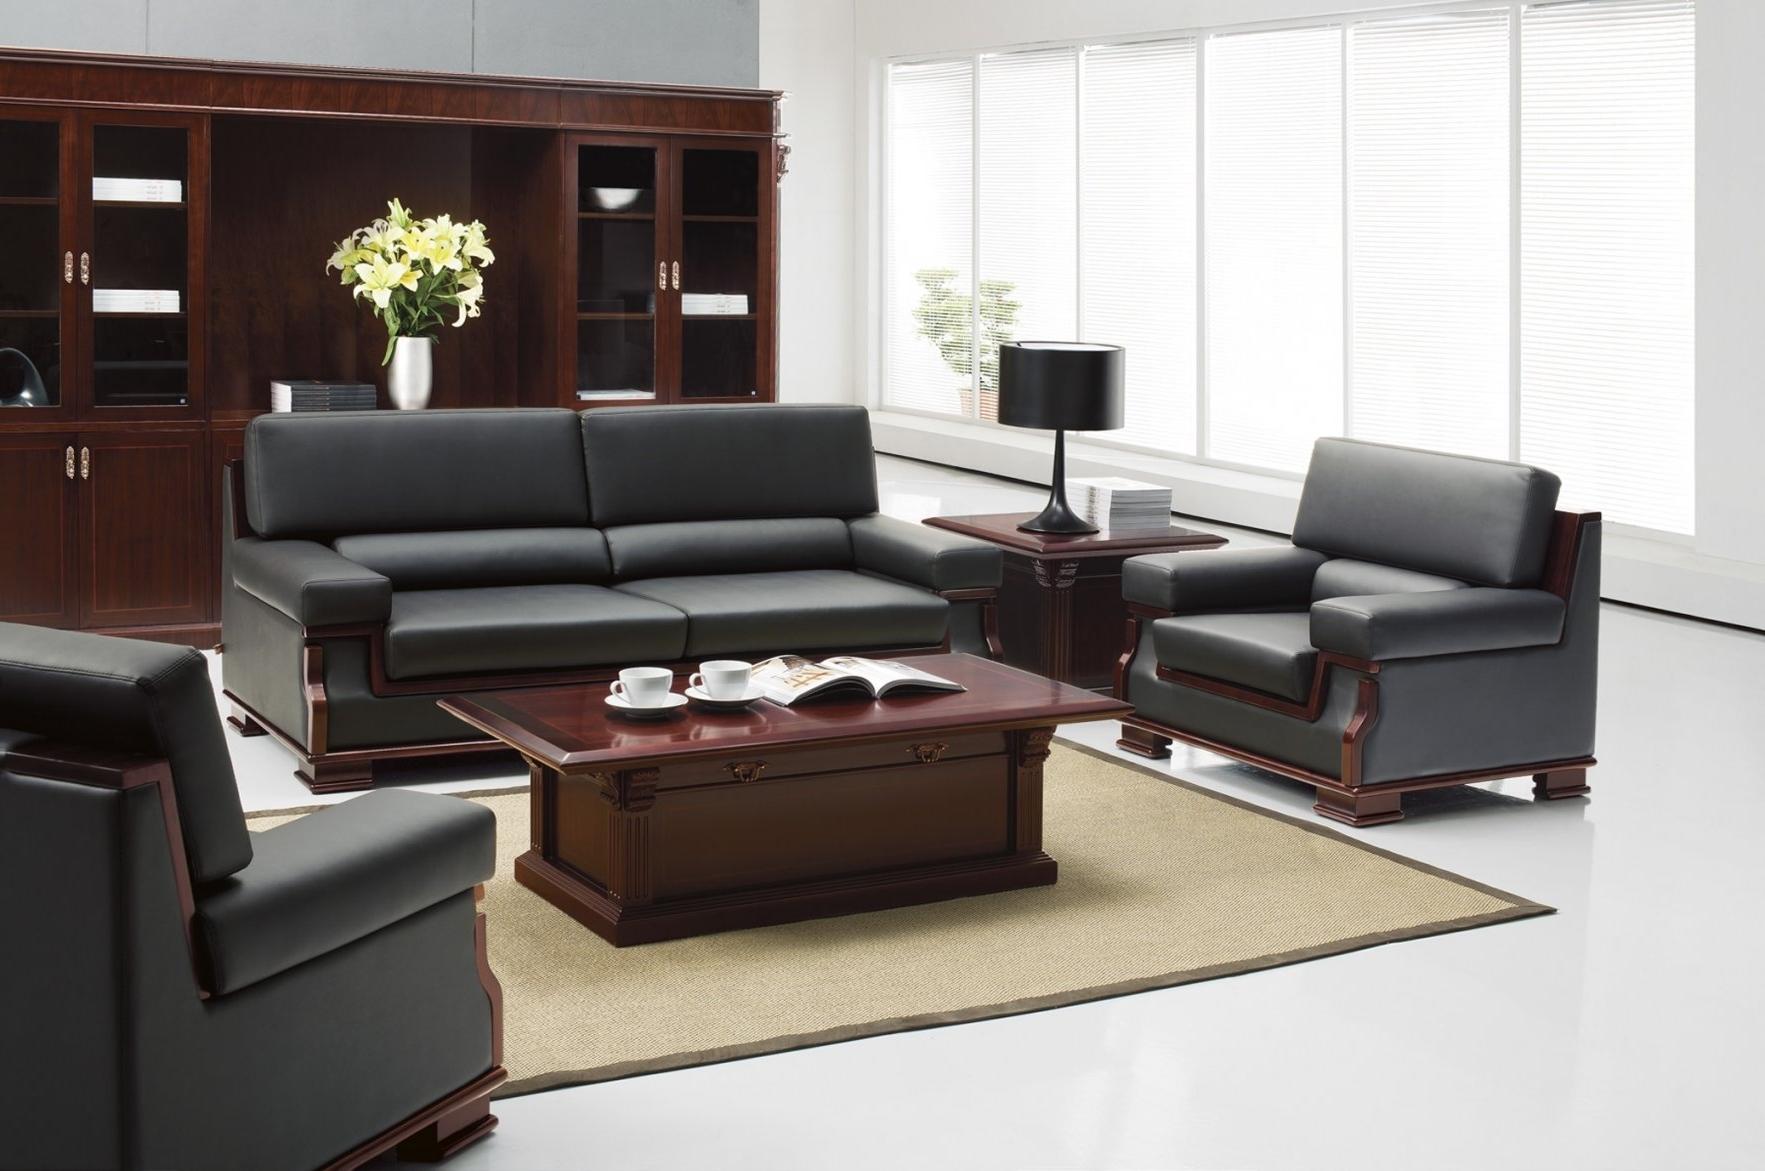 Executive Sofa (View 2 of 15)